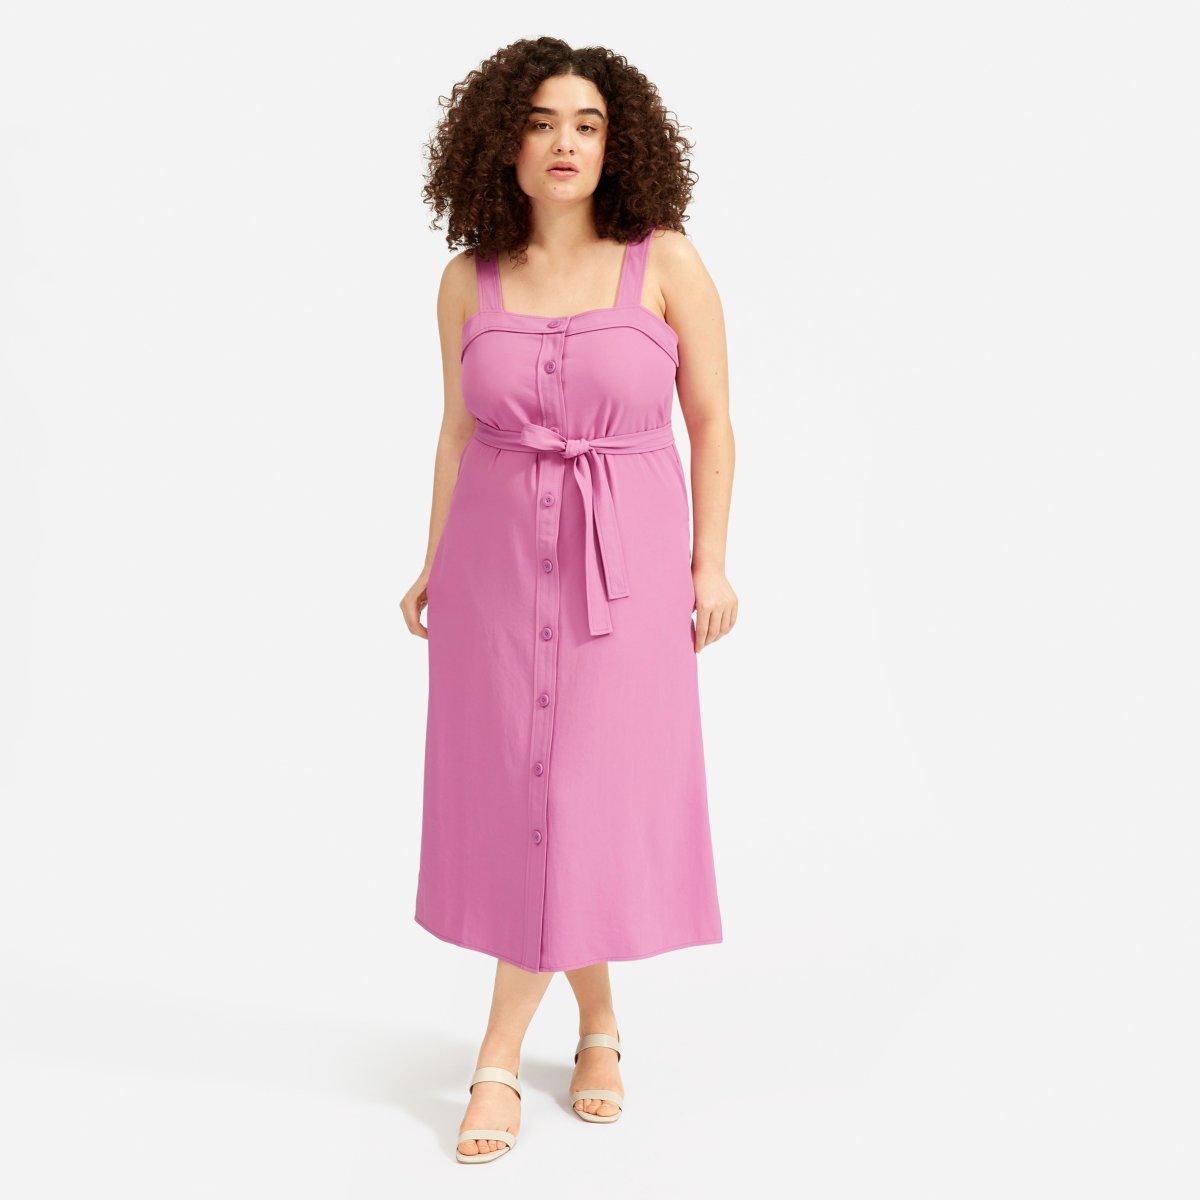 Everlane Choose What You Pay / Magenta Dress - Sunshine Style, A Florida Based Fashion Blog